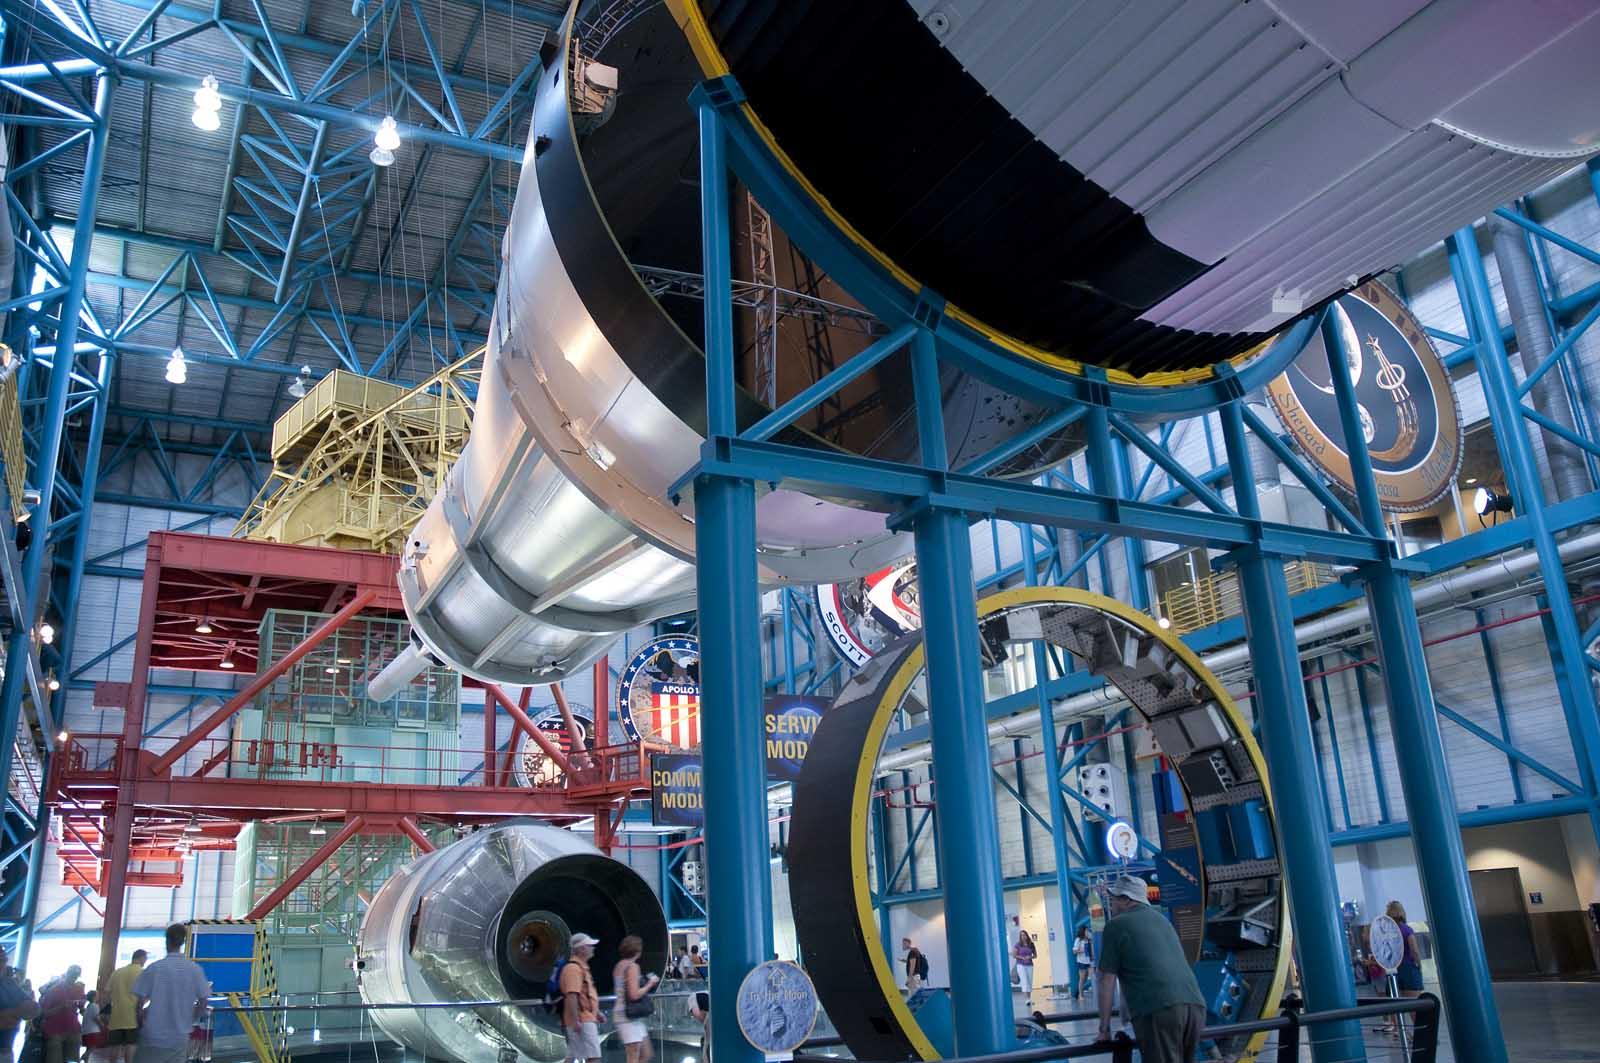 The Kennedy Space Center in Orlando Florida